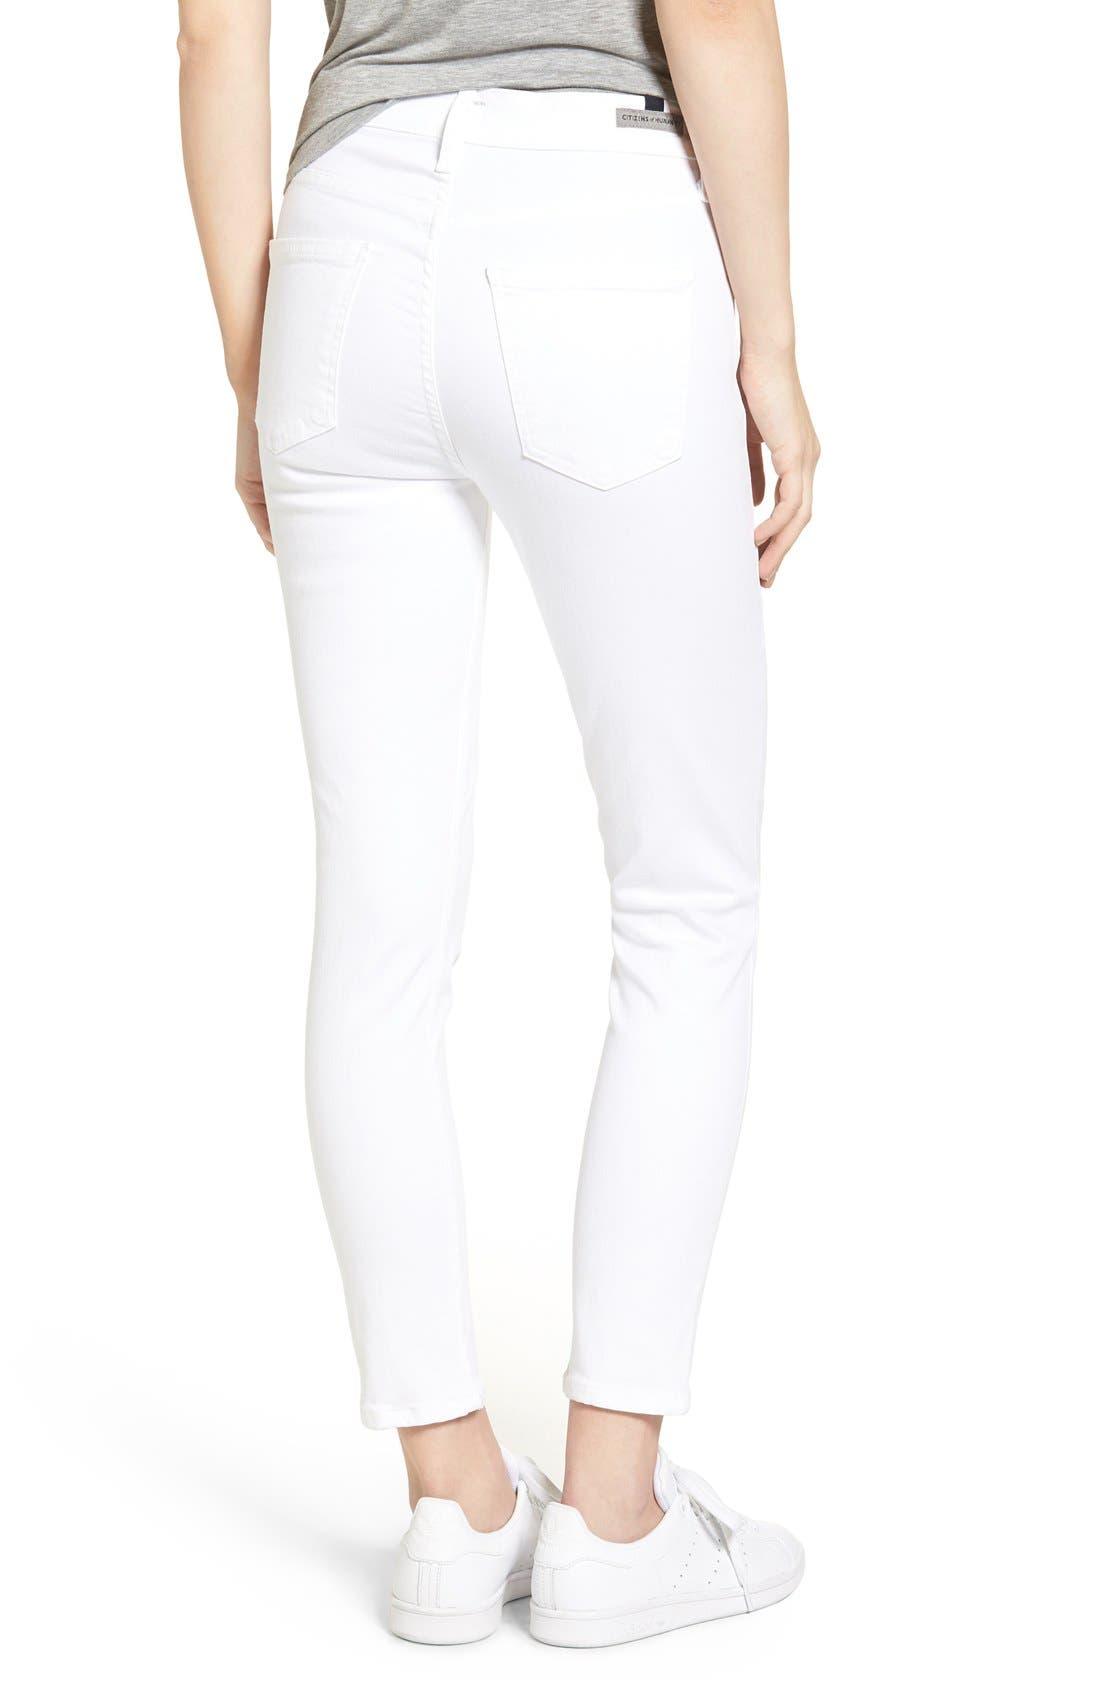 Rocket High Waist Crop Skinny Jeans,                             Alternate thumbnail 4, color,                             SCULPT WHITE